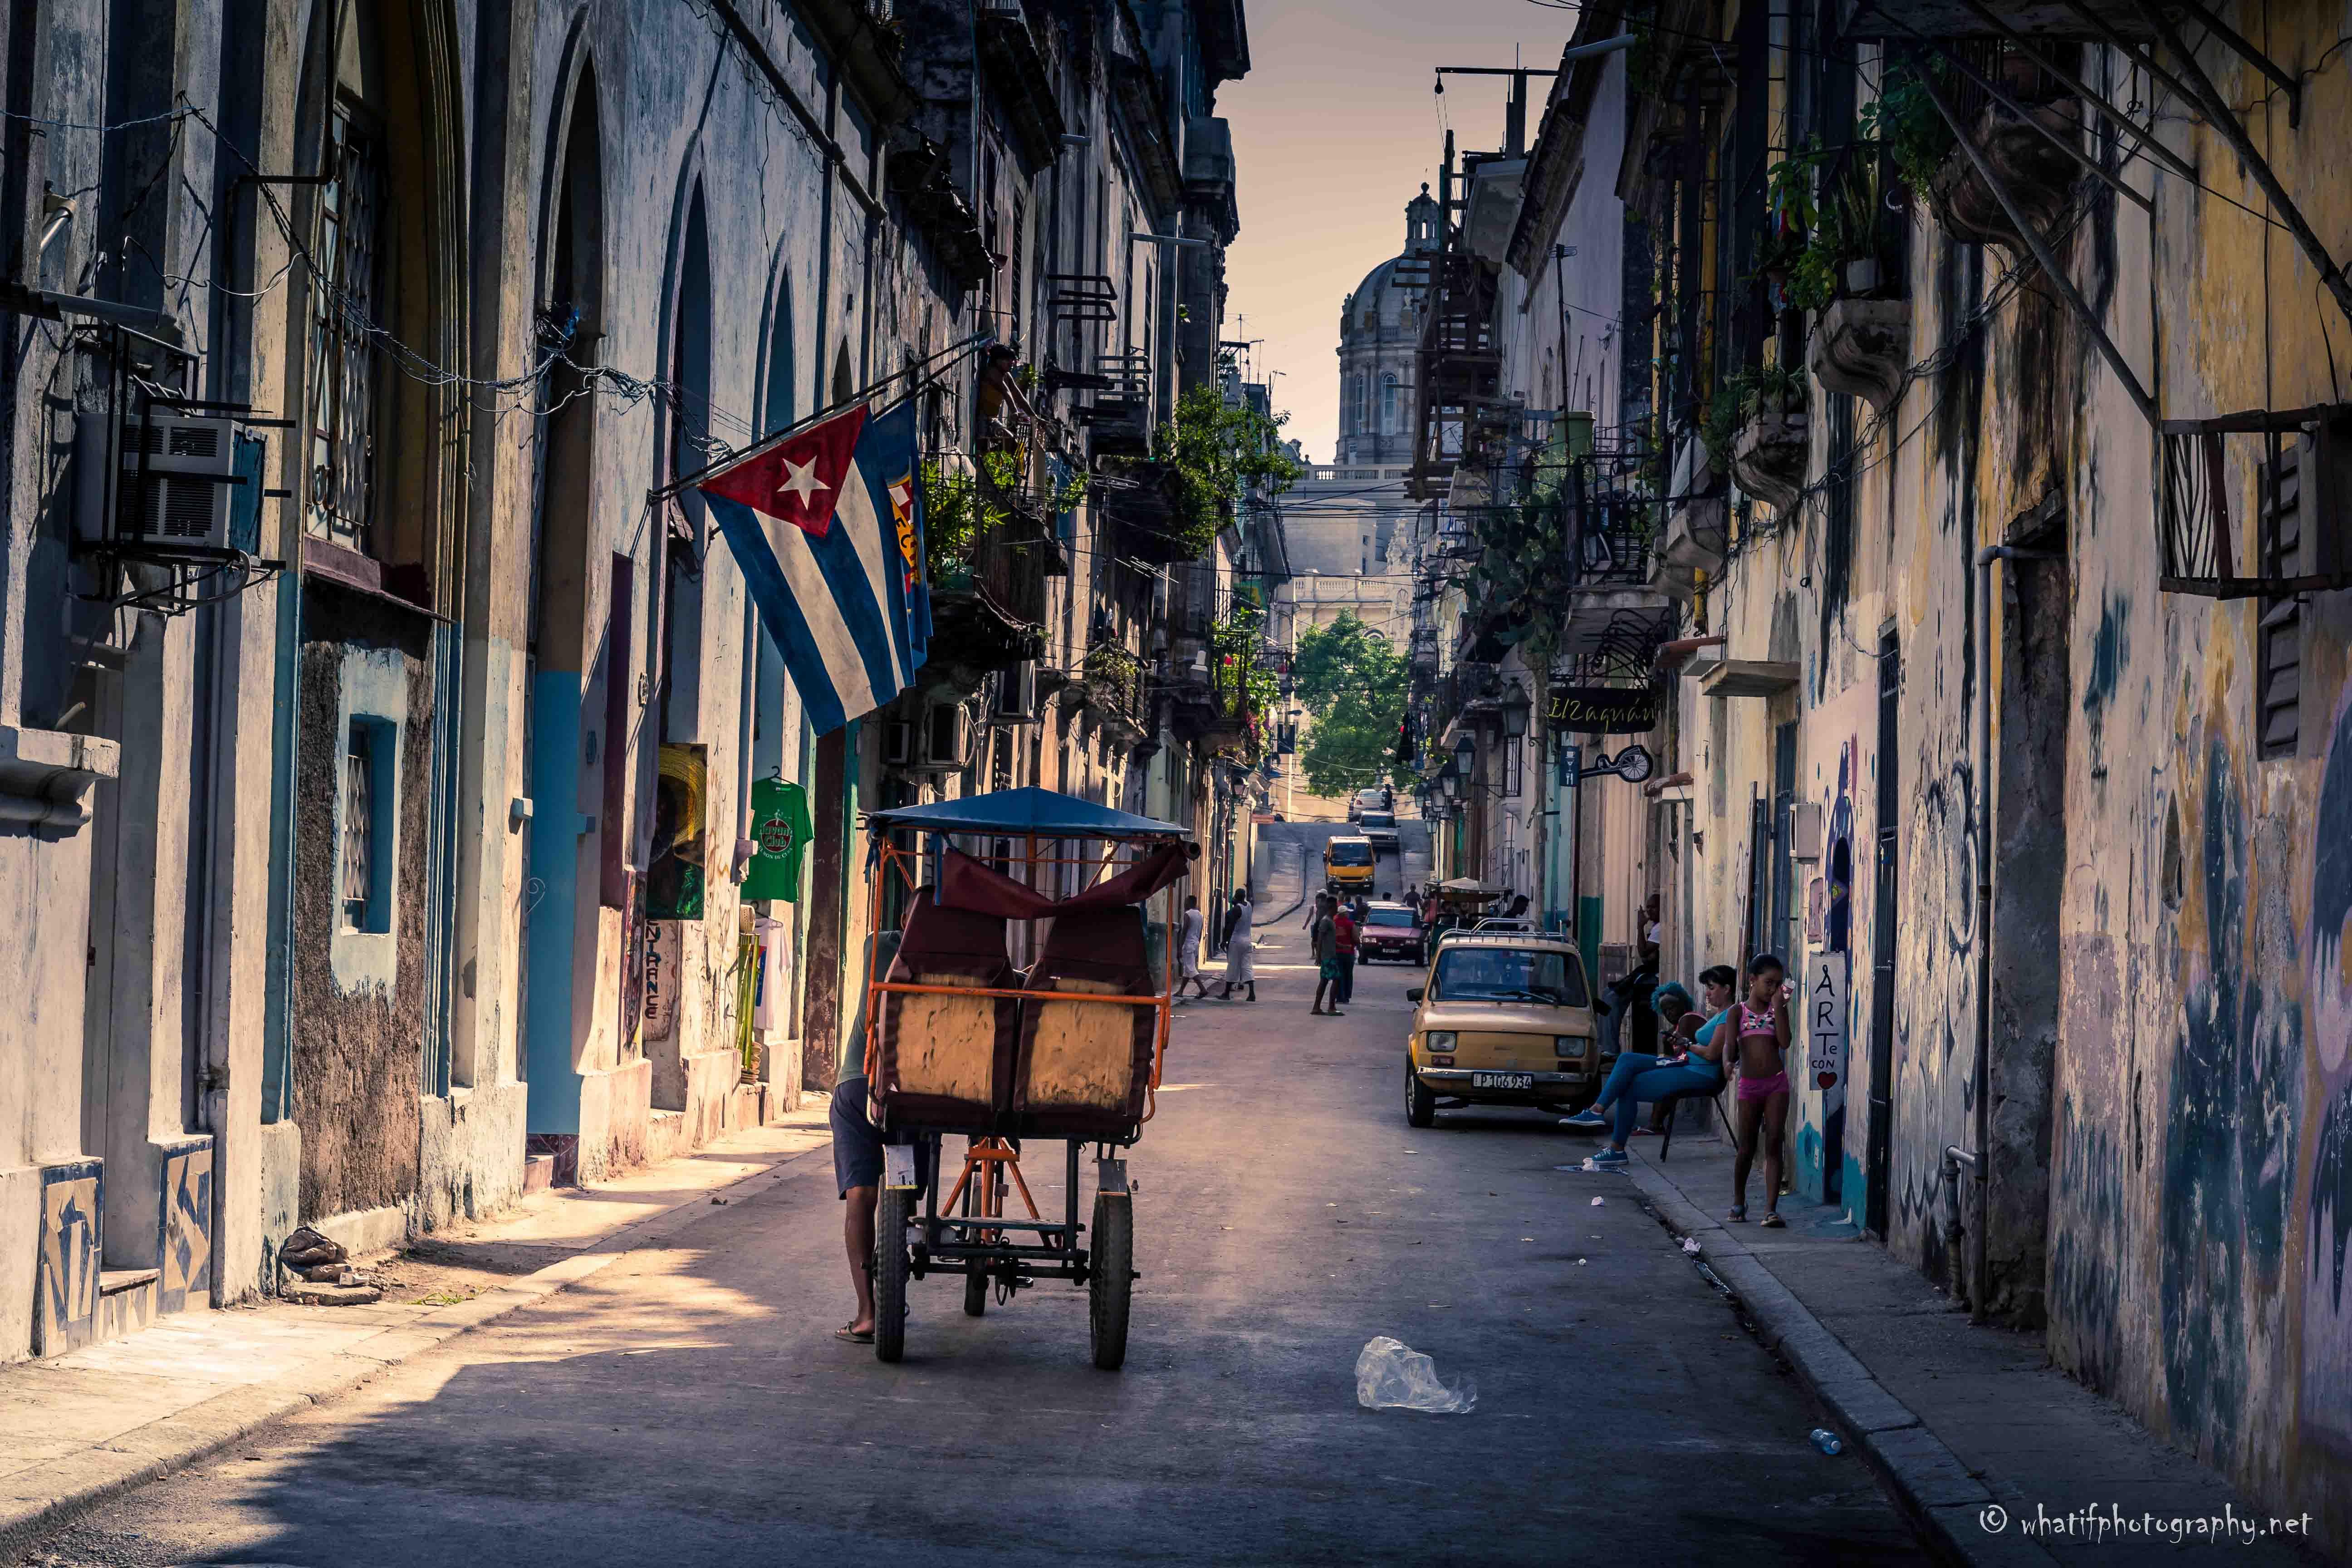 Busy street life of Havana